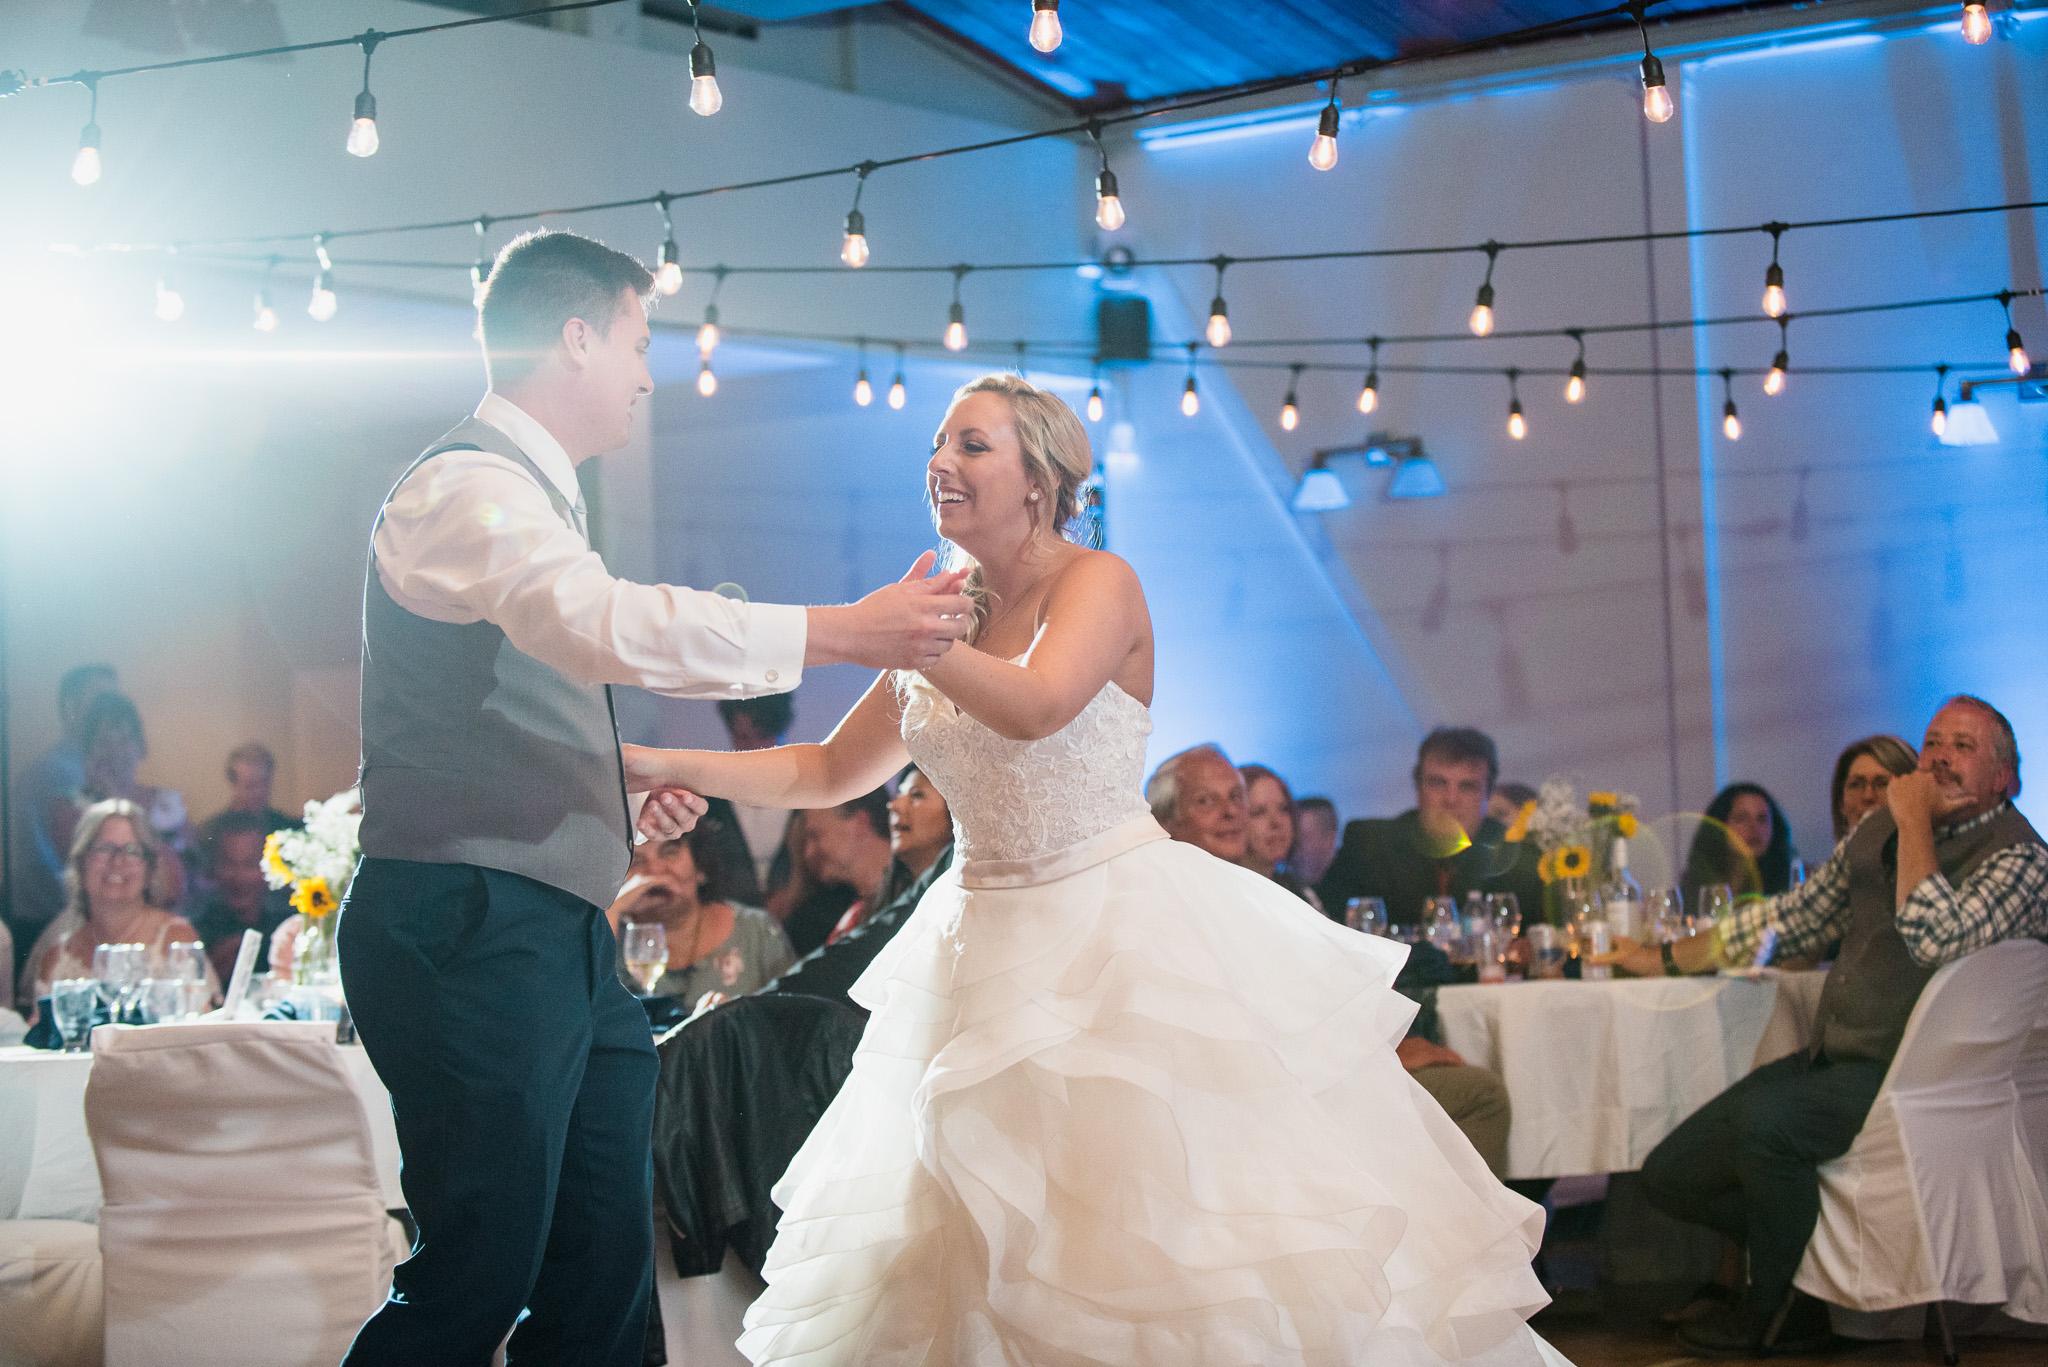 victoria-wedding-photographers-prospect-community-hall-wedding-66.jpg